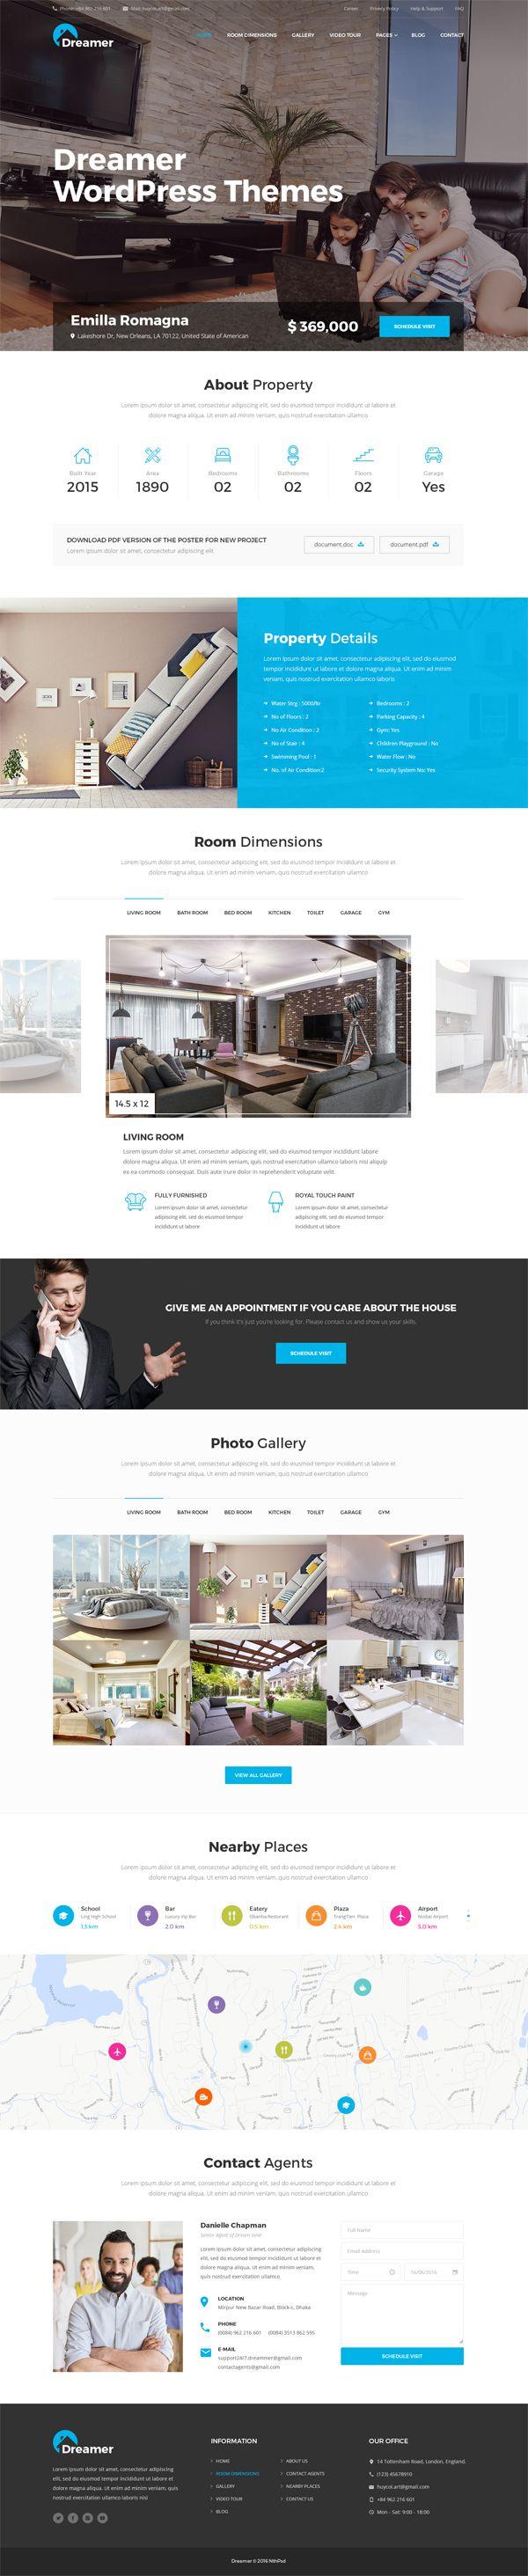 Dreamer - Single Property PSD Templates #psdtemplates #websitetemplates #webdesign